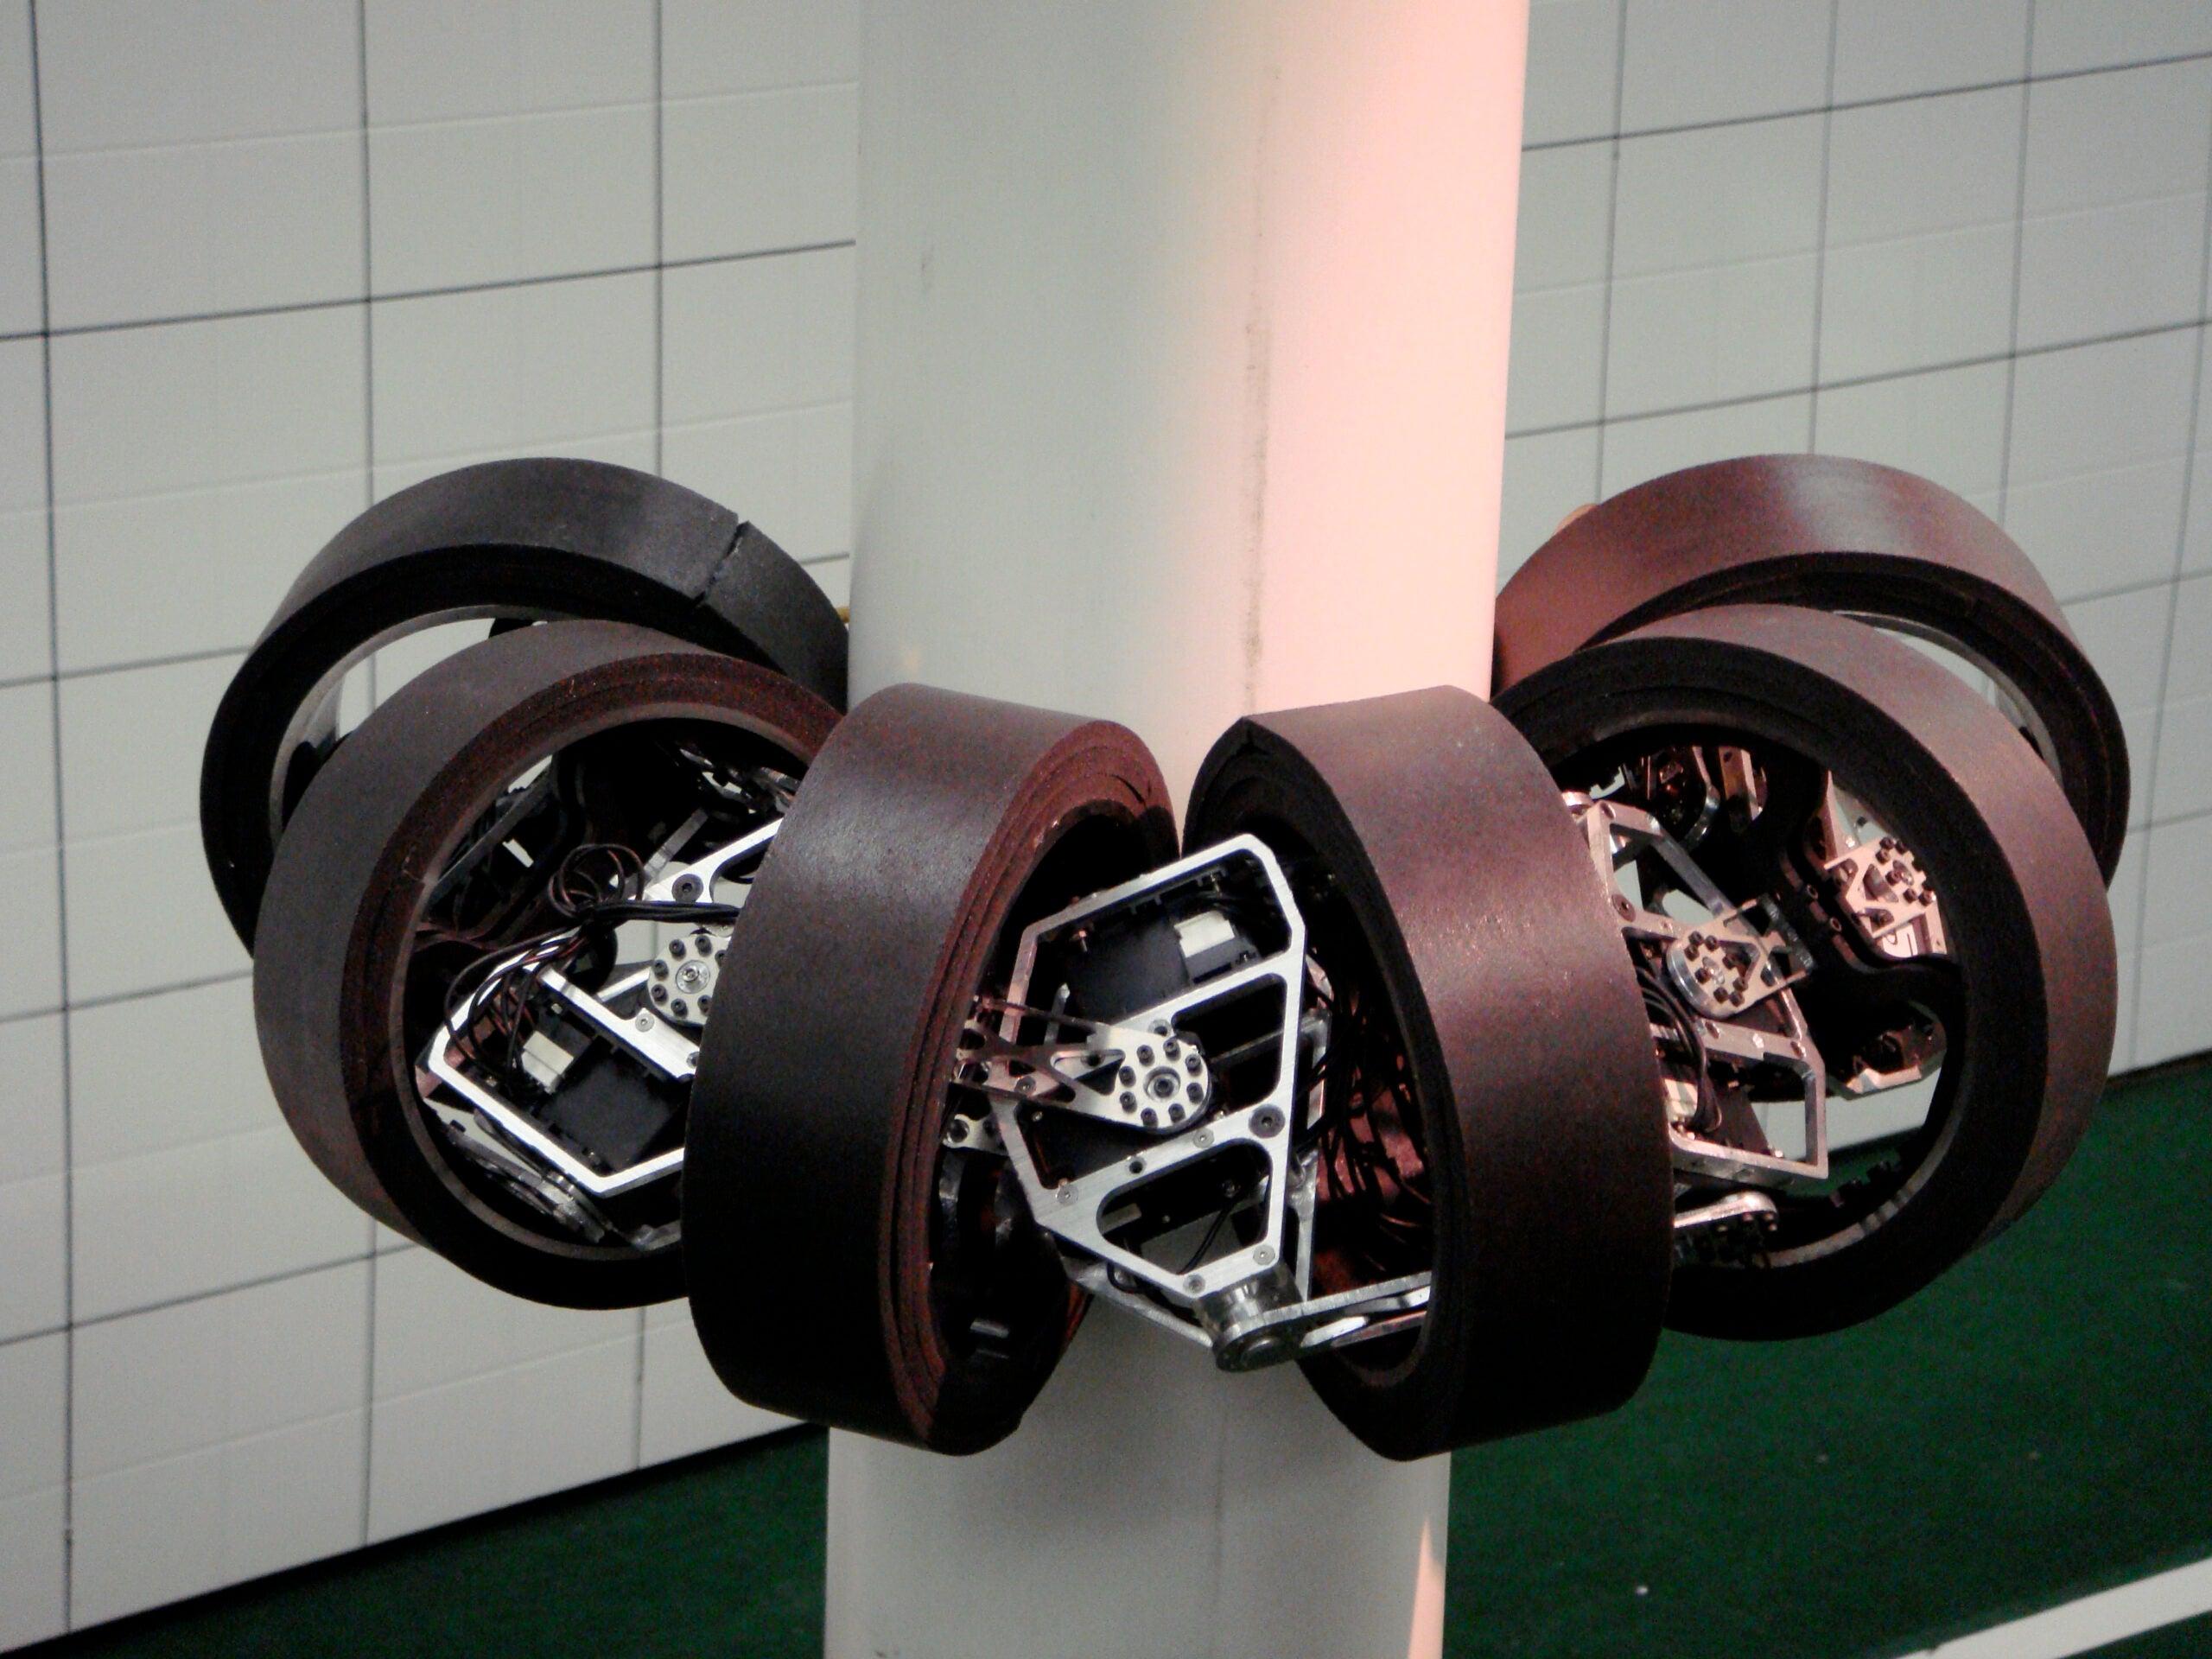 Pole-Dancing Robots